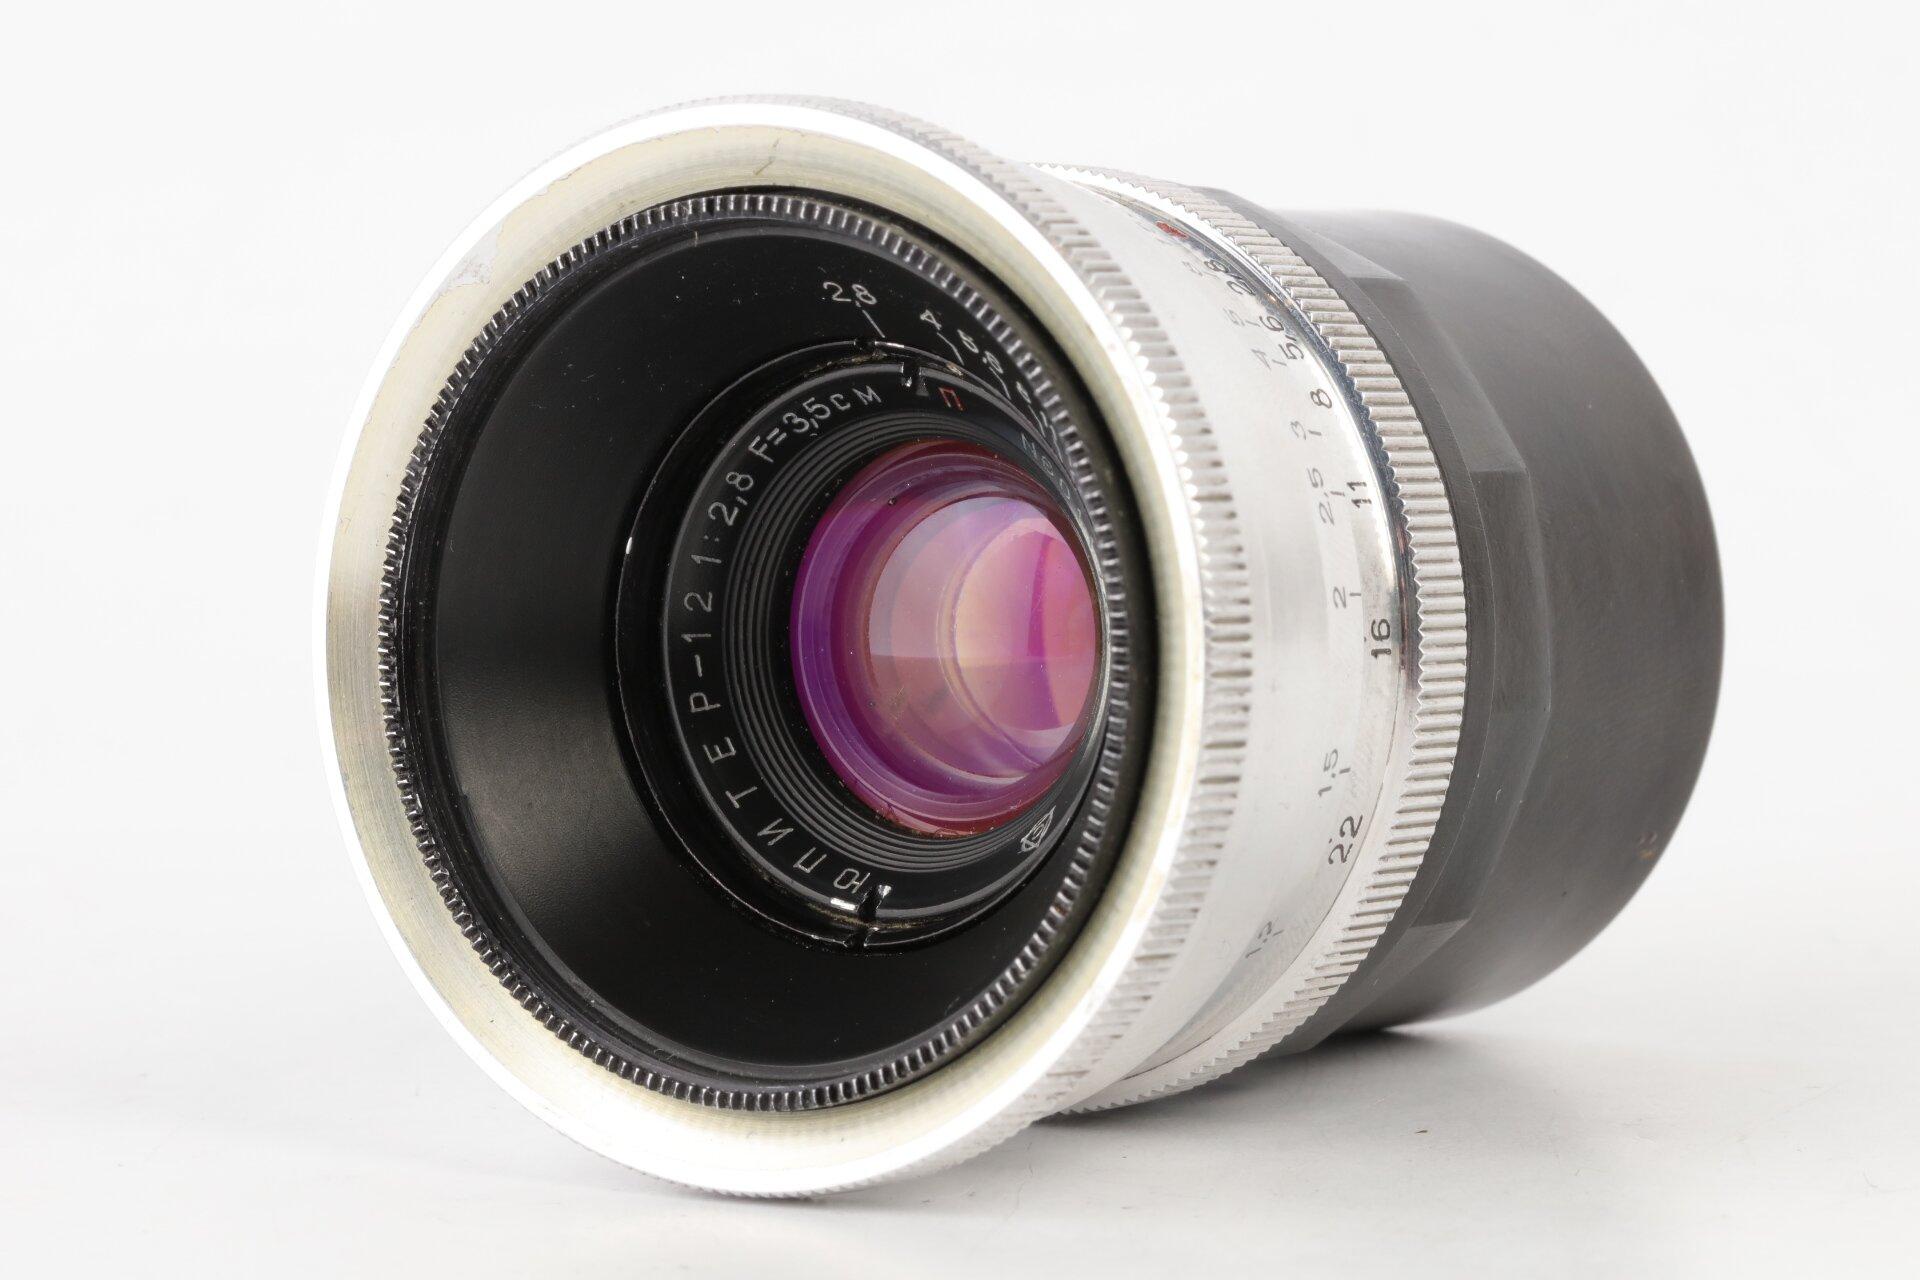 Jupiter-12 2,8/35mm silber M39